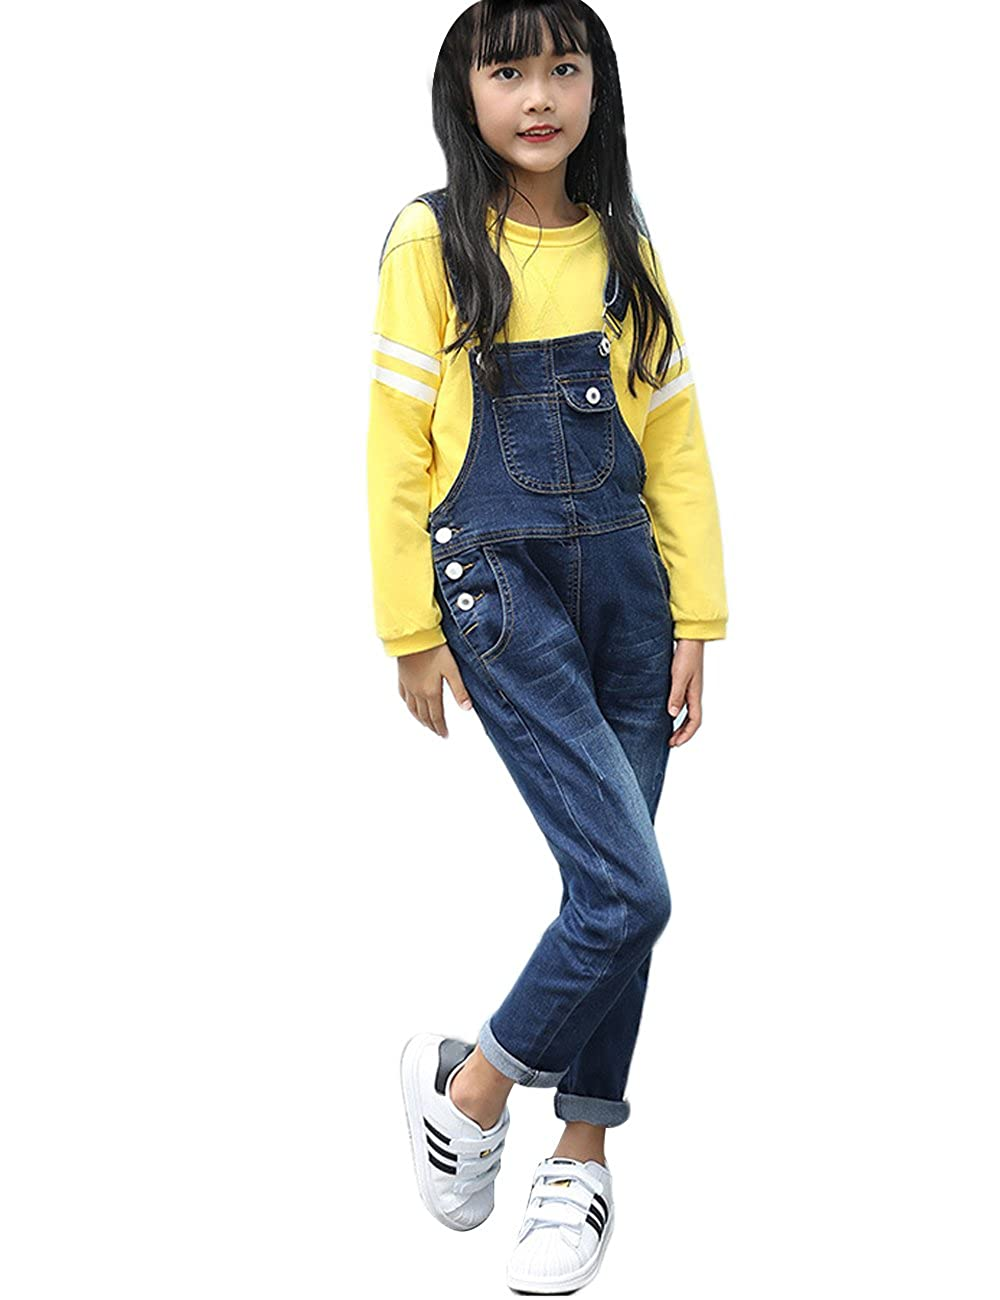 Menschwear Girl's Cotton Blue Denim Bib Overalls Stone Washed Casual Girl Bib Overalls USA-GZCF-B101